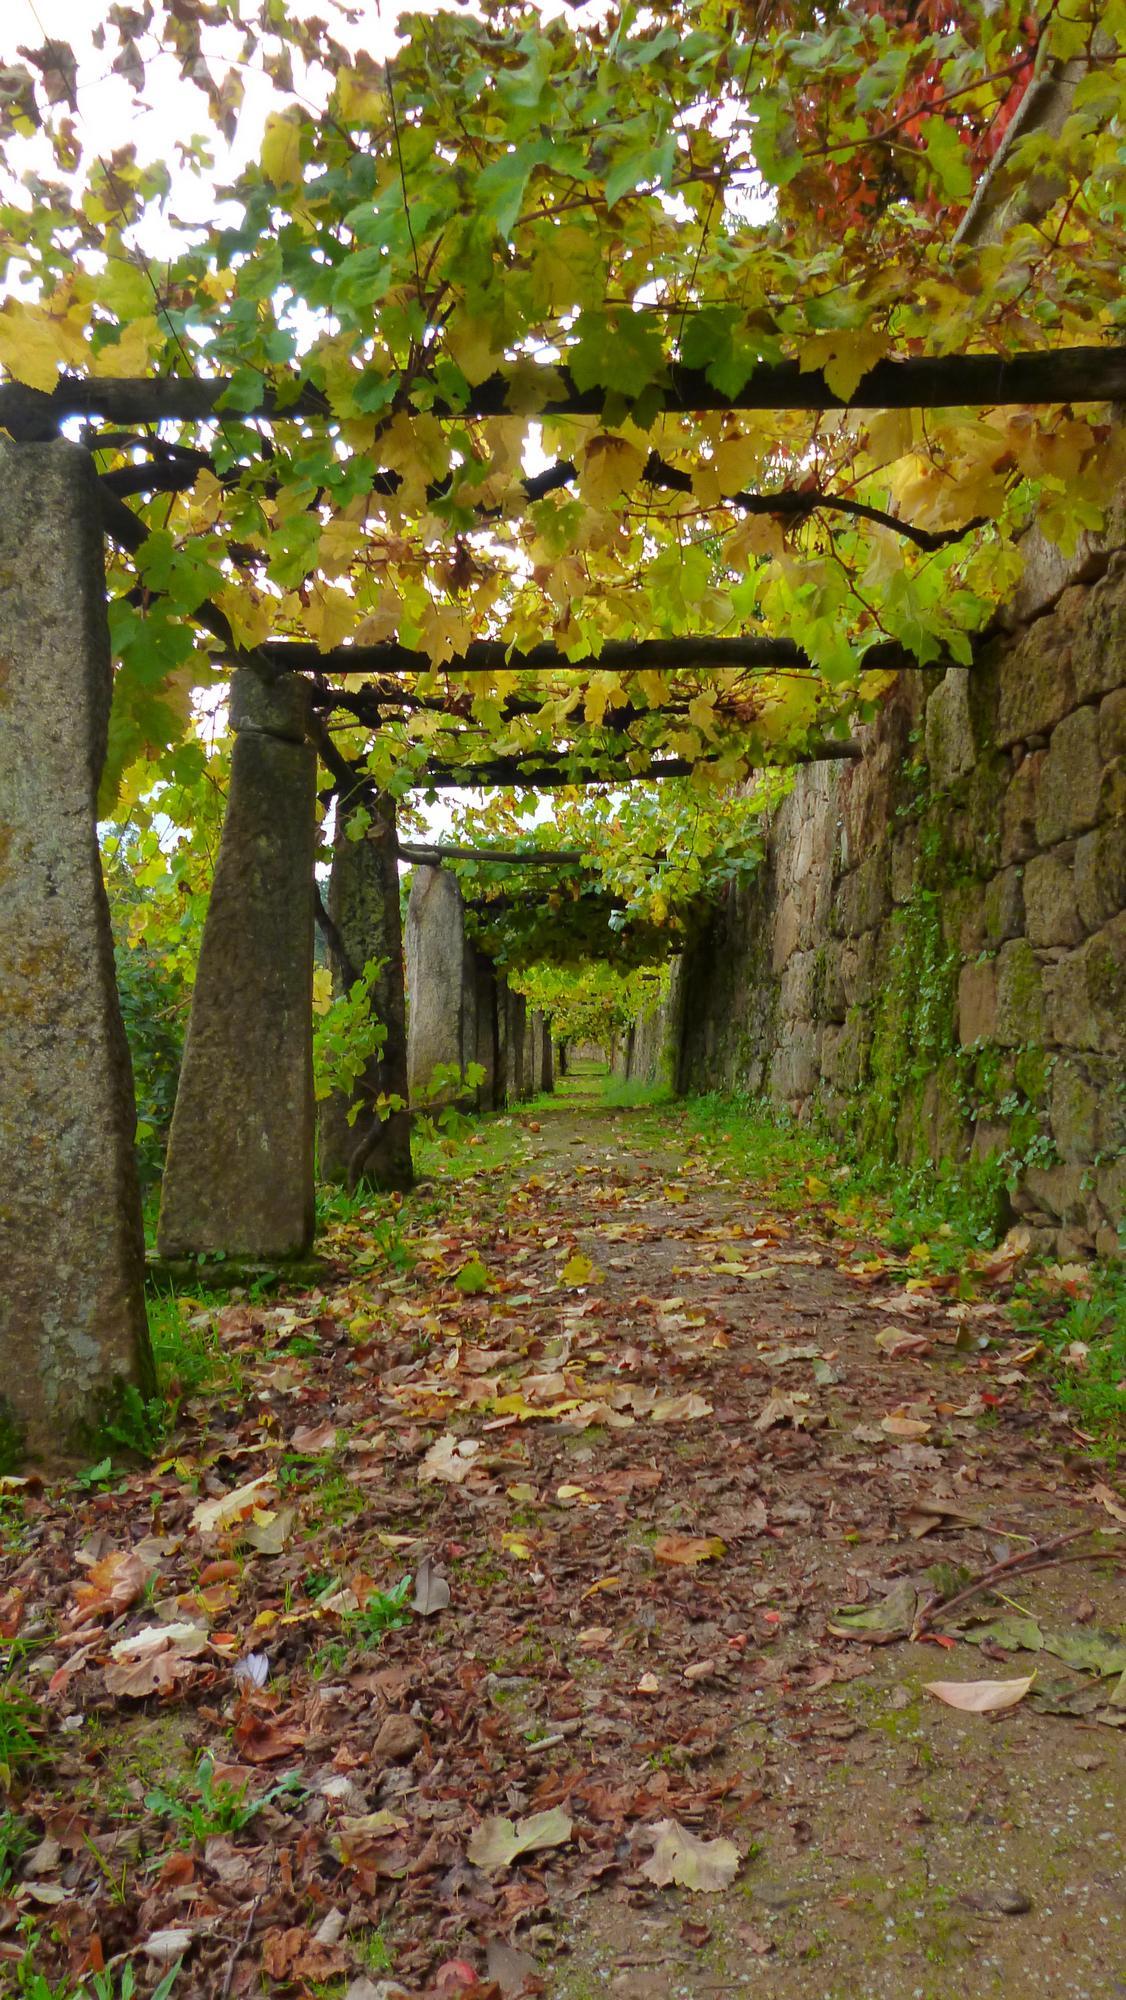 Vinná réva vtiskla kraji kolem Doura ducha